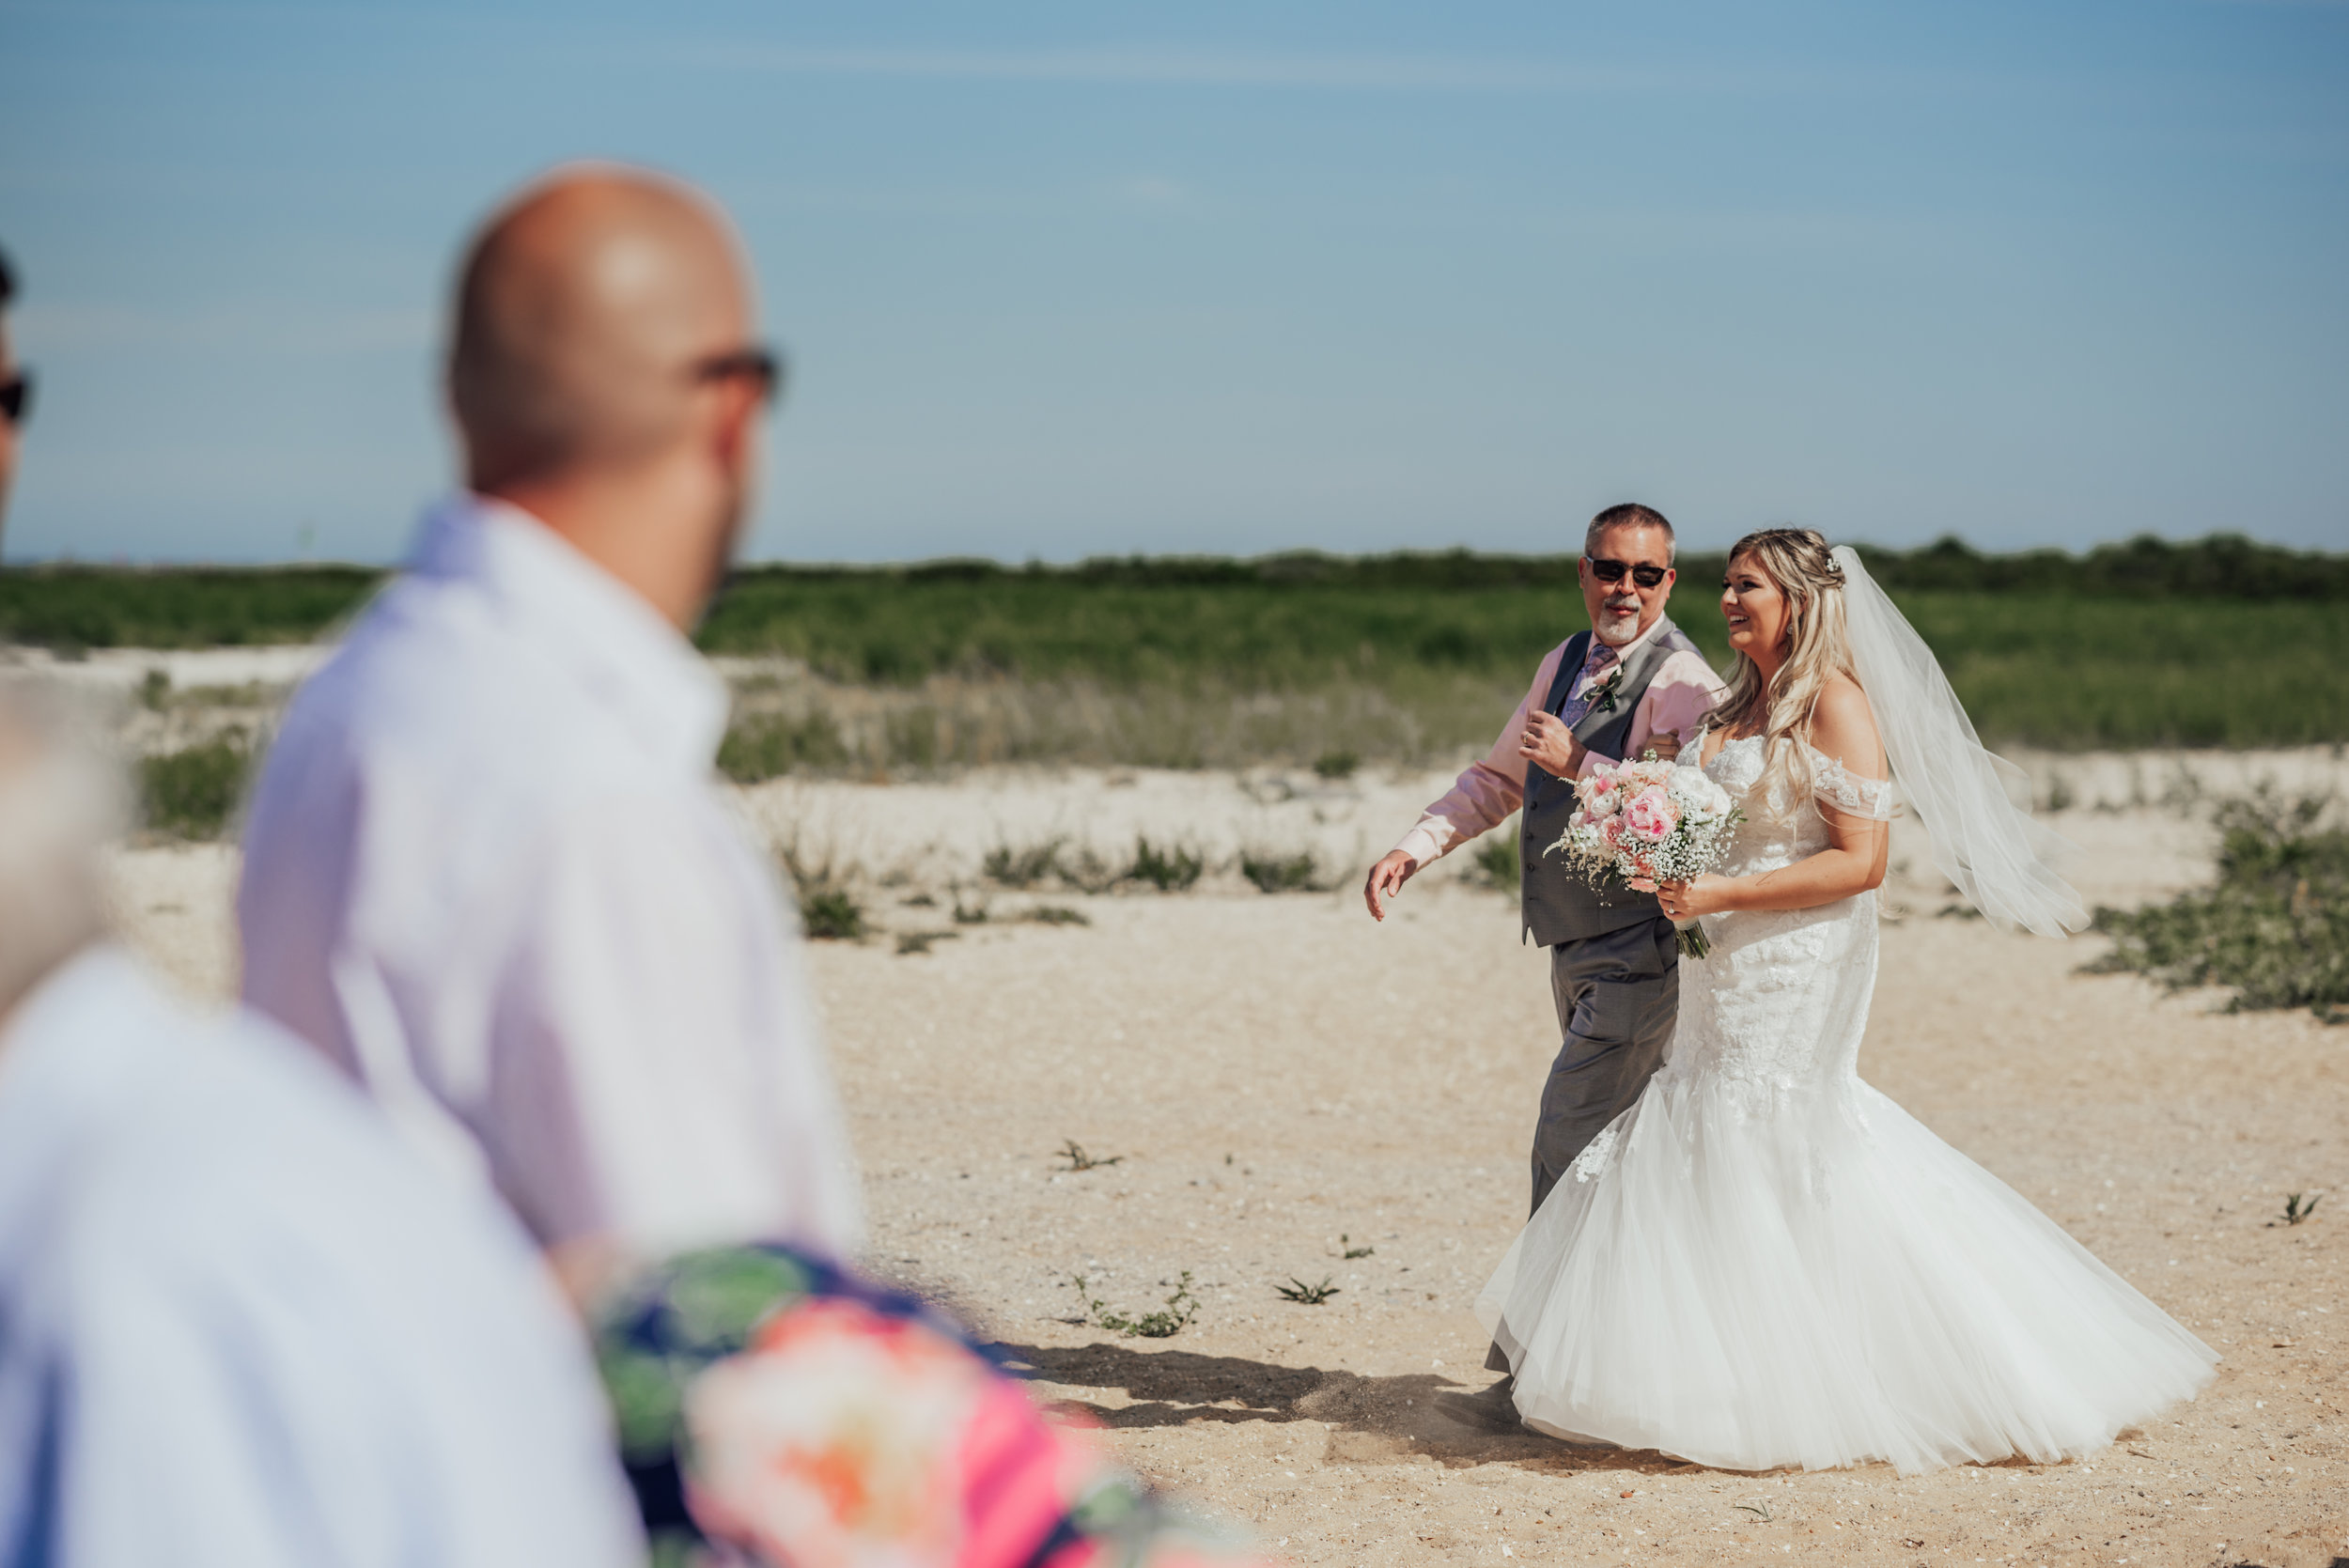 New Jersey Wedding Photographer, Felsberg Photography LBI wedding photography 61.jpg